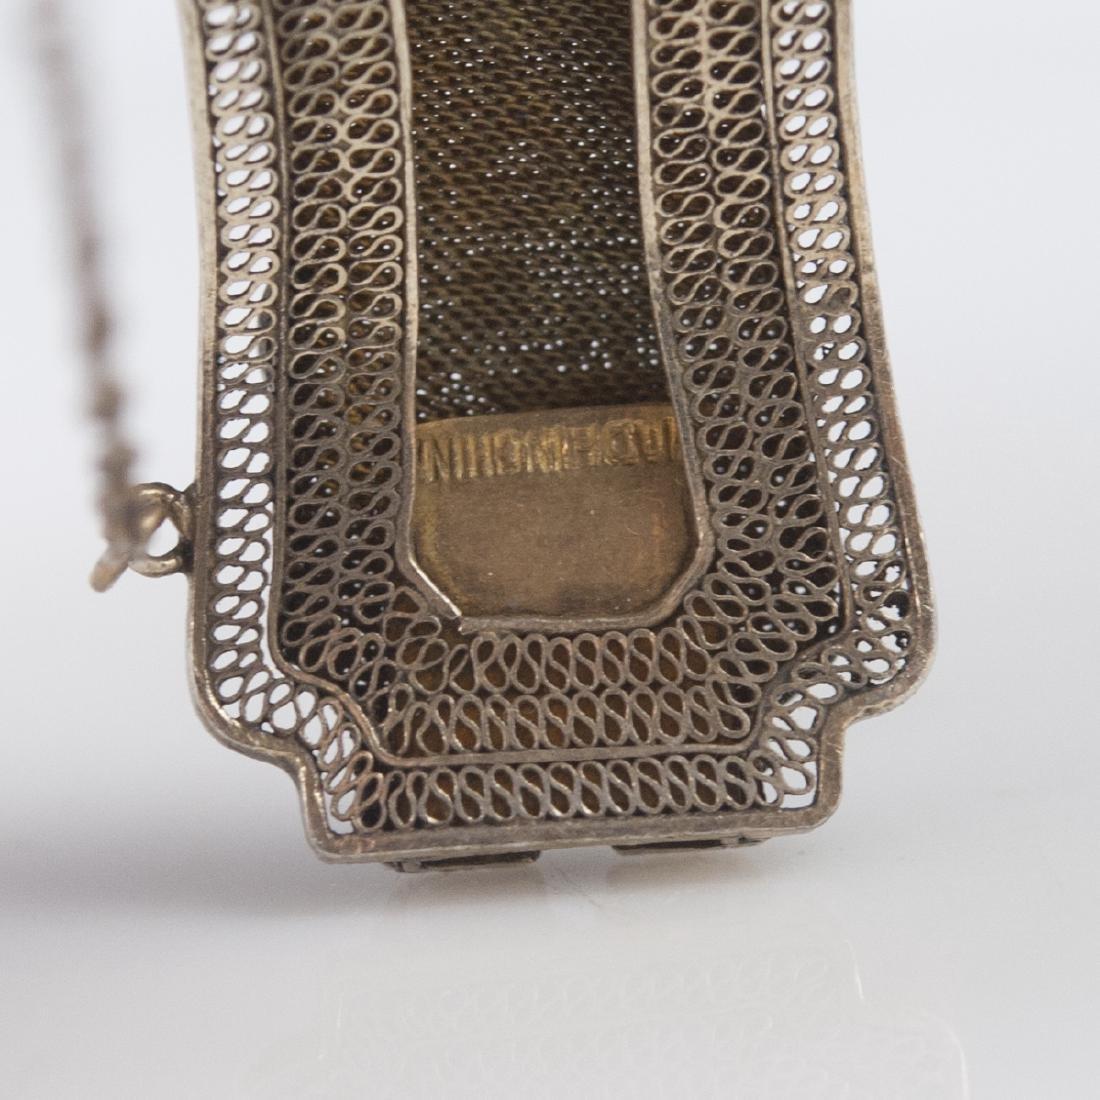 Chinese Vermeil Silver Filigree Amber Cuff - 2